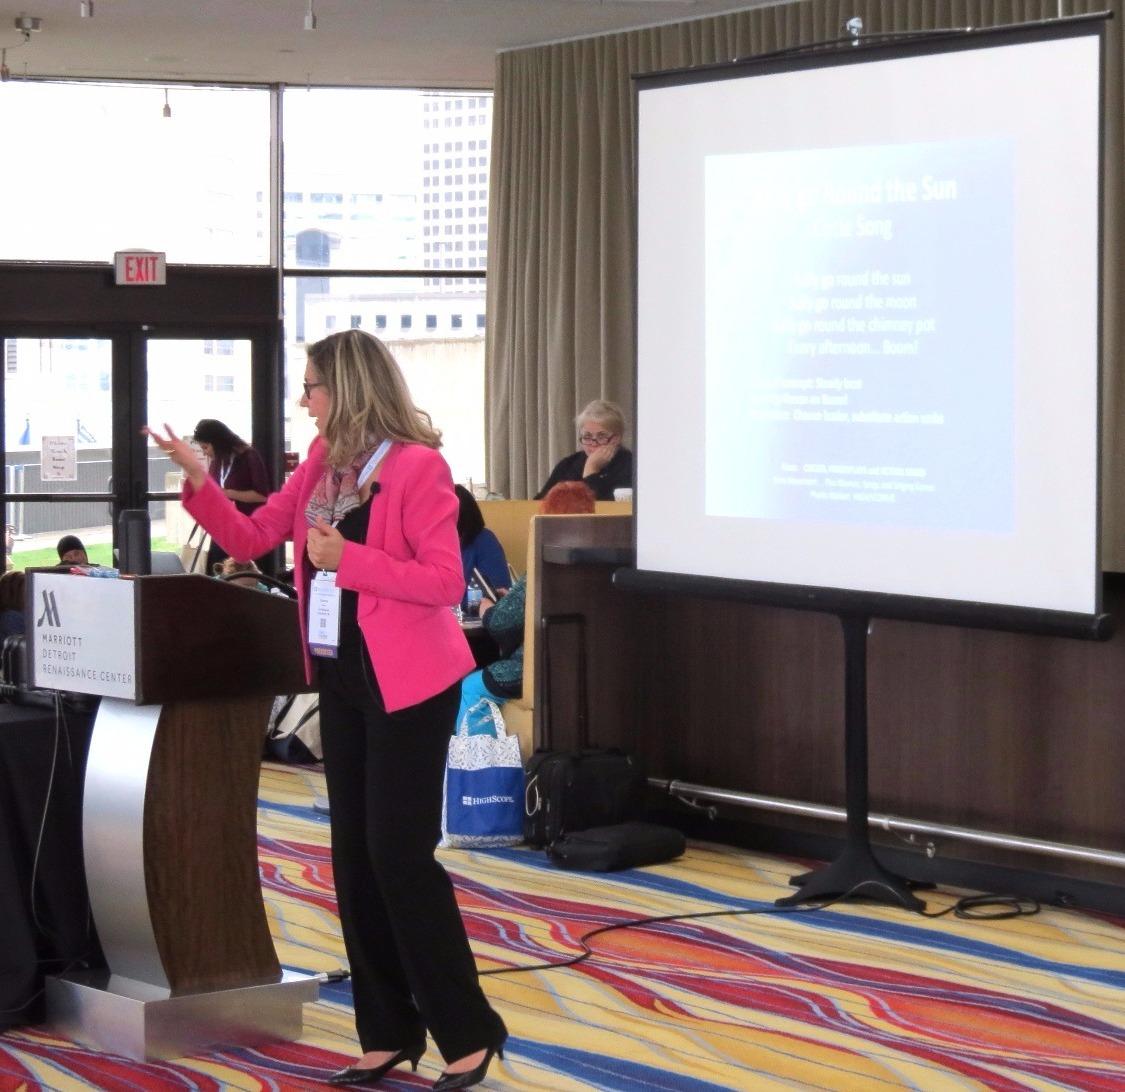 Yolanda Borras Training at High Scope Conference 2_edited